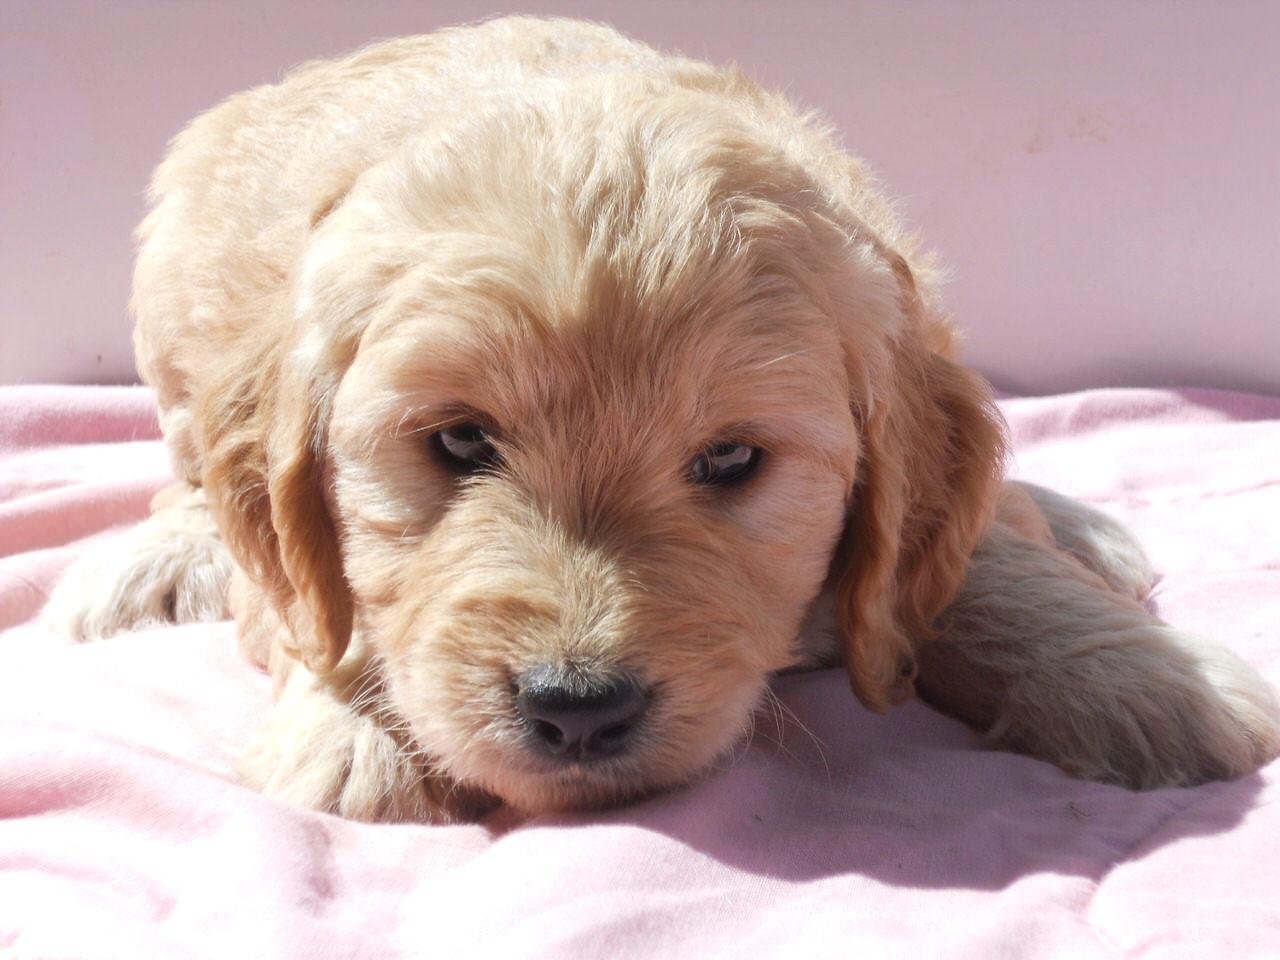 Island Puppies  Puppies For SaleDog BreedersPet Stores